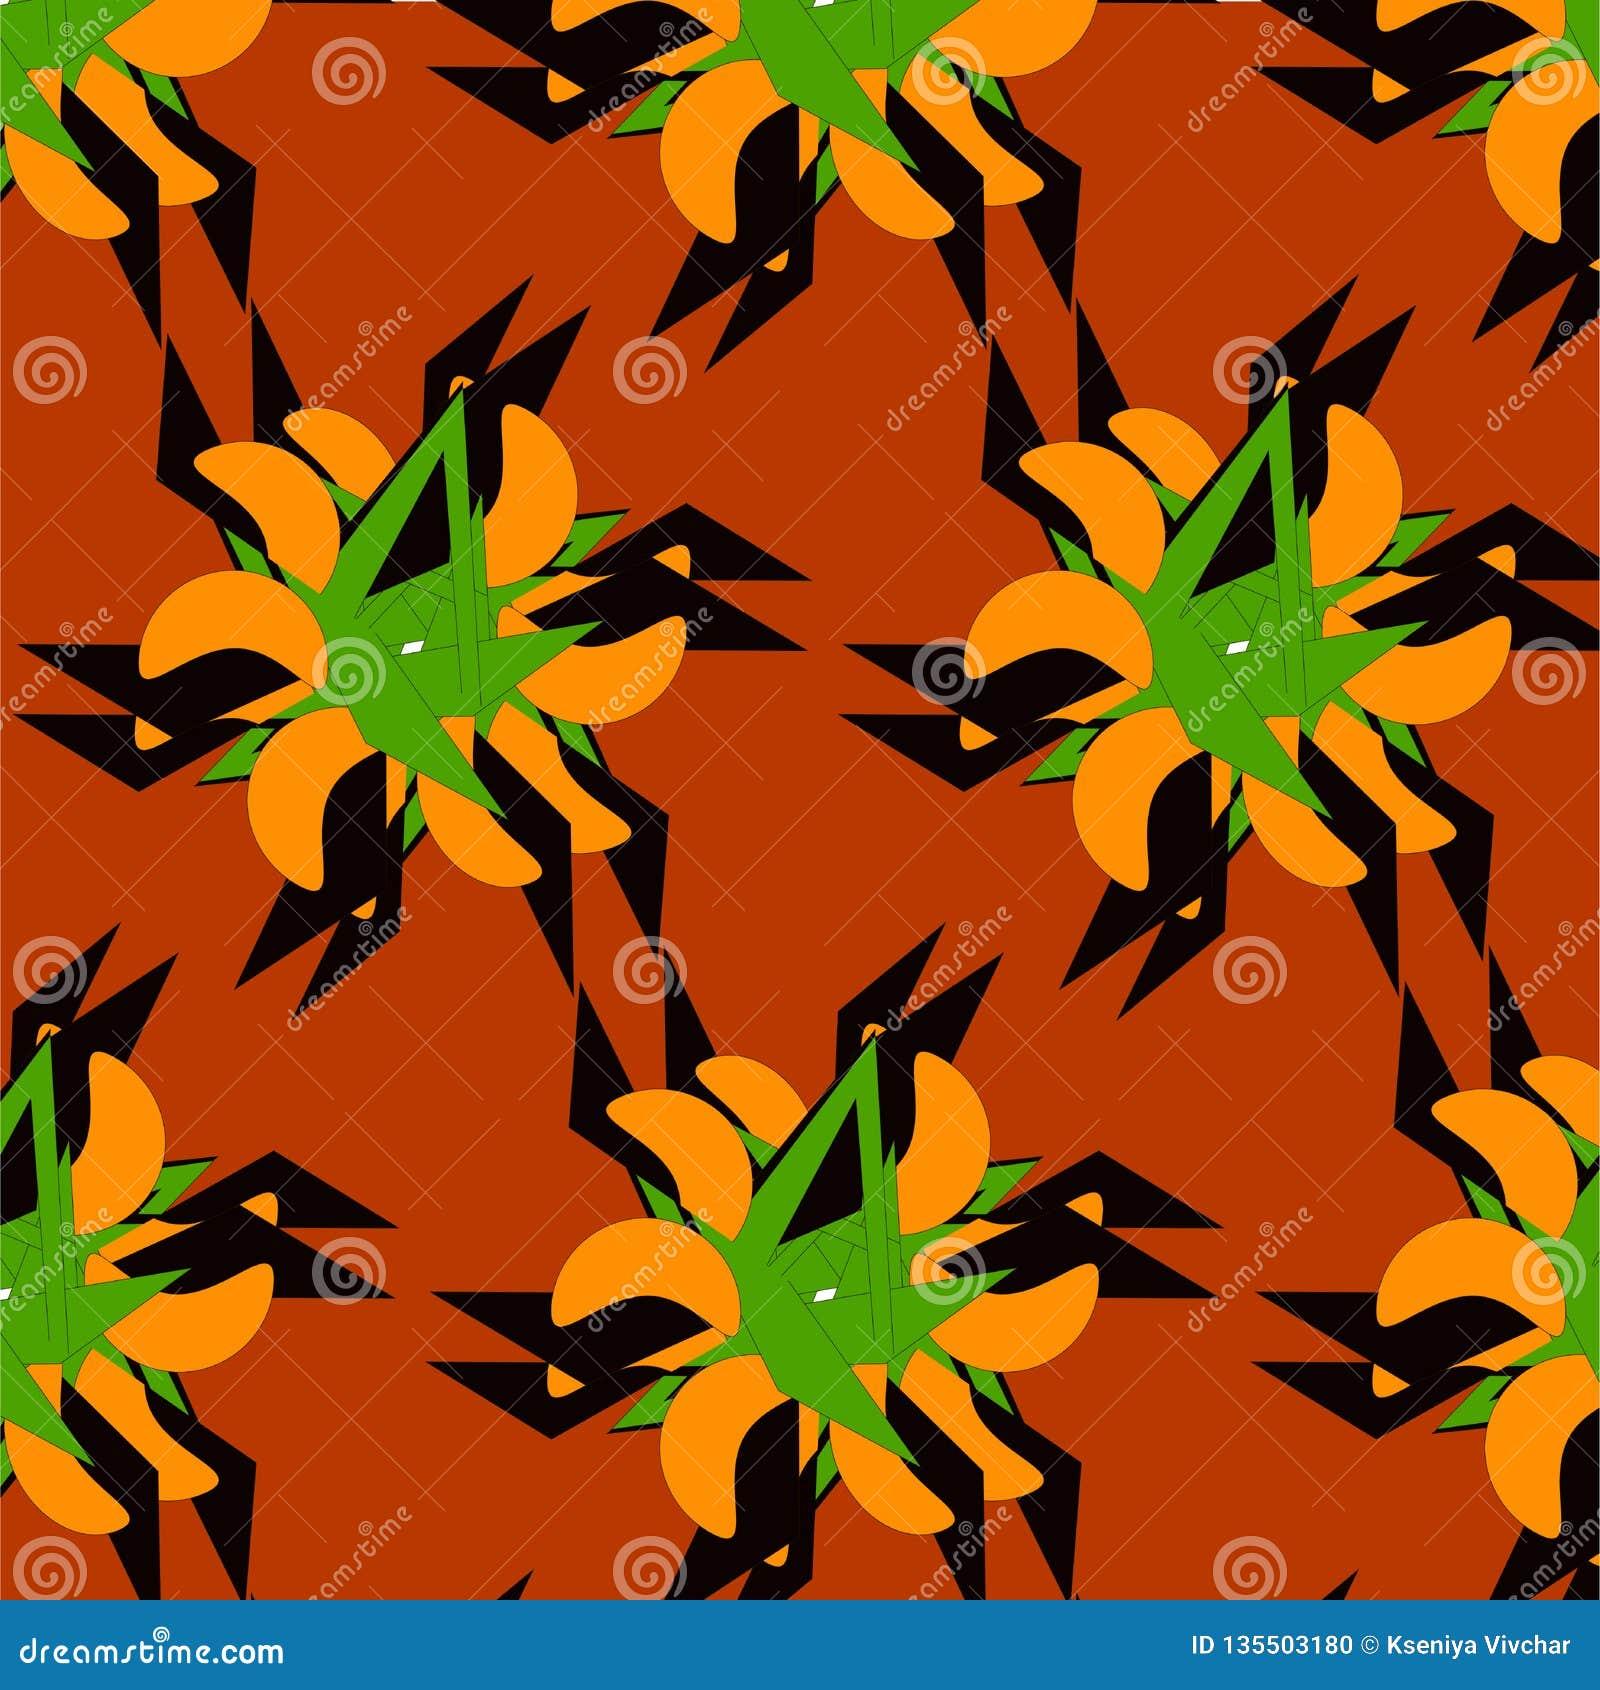 Spring pattern on orange background